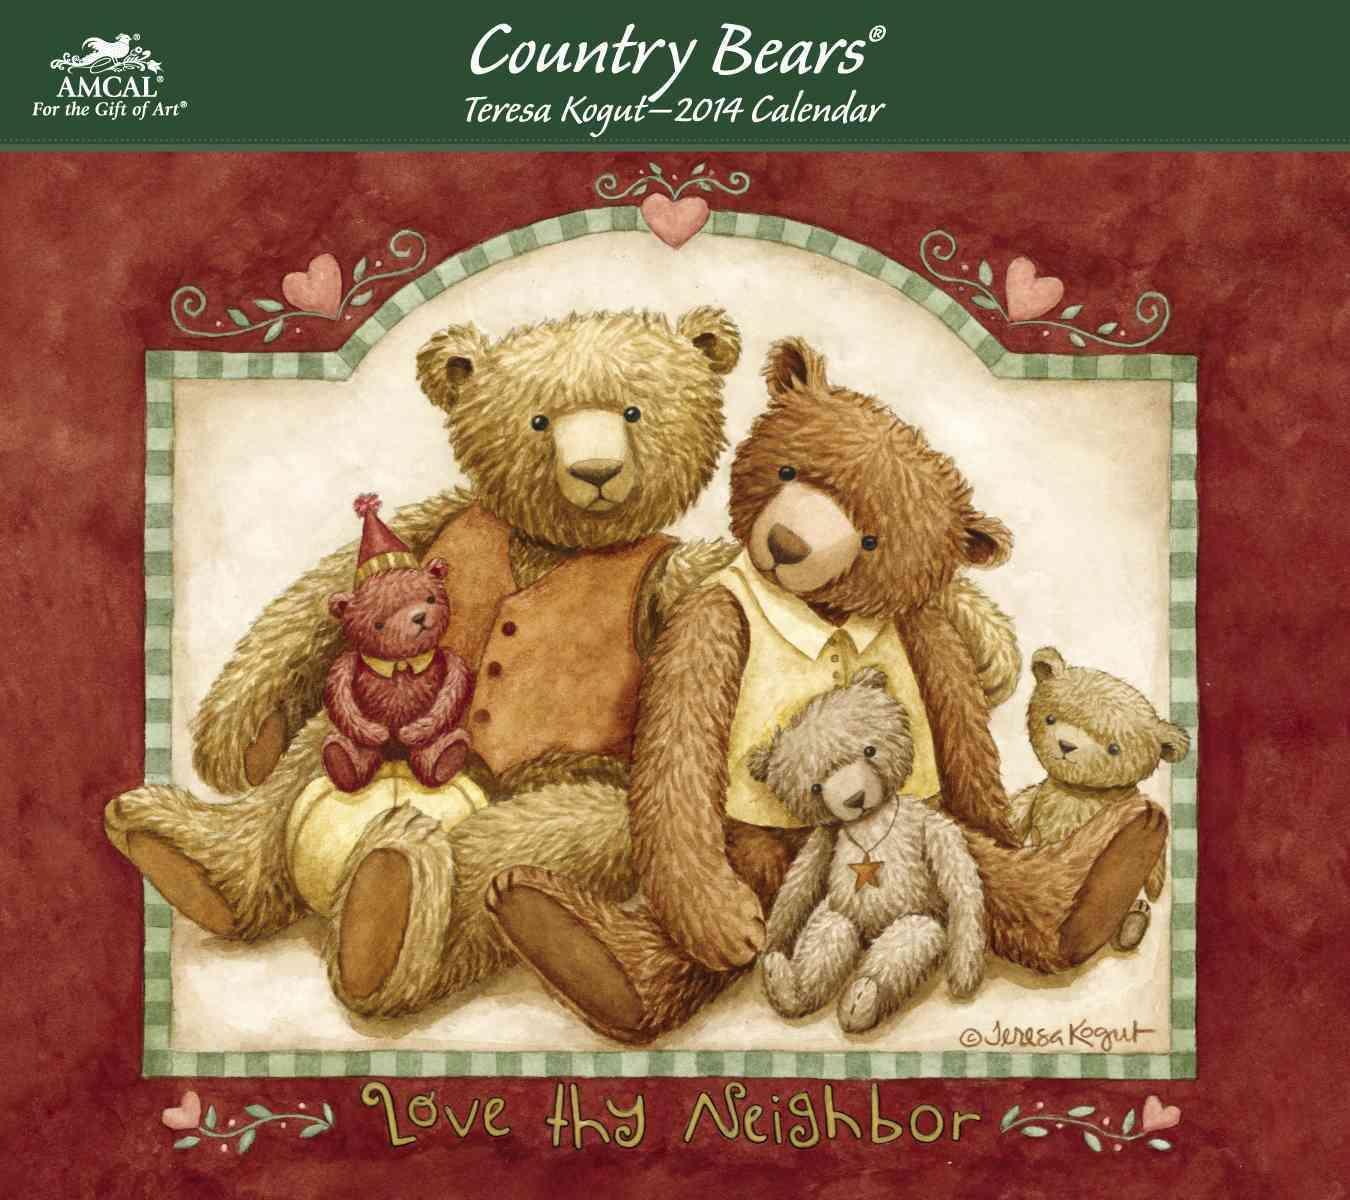 Country Bears 2014 Calendar (Calendar)